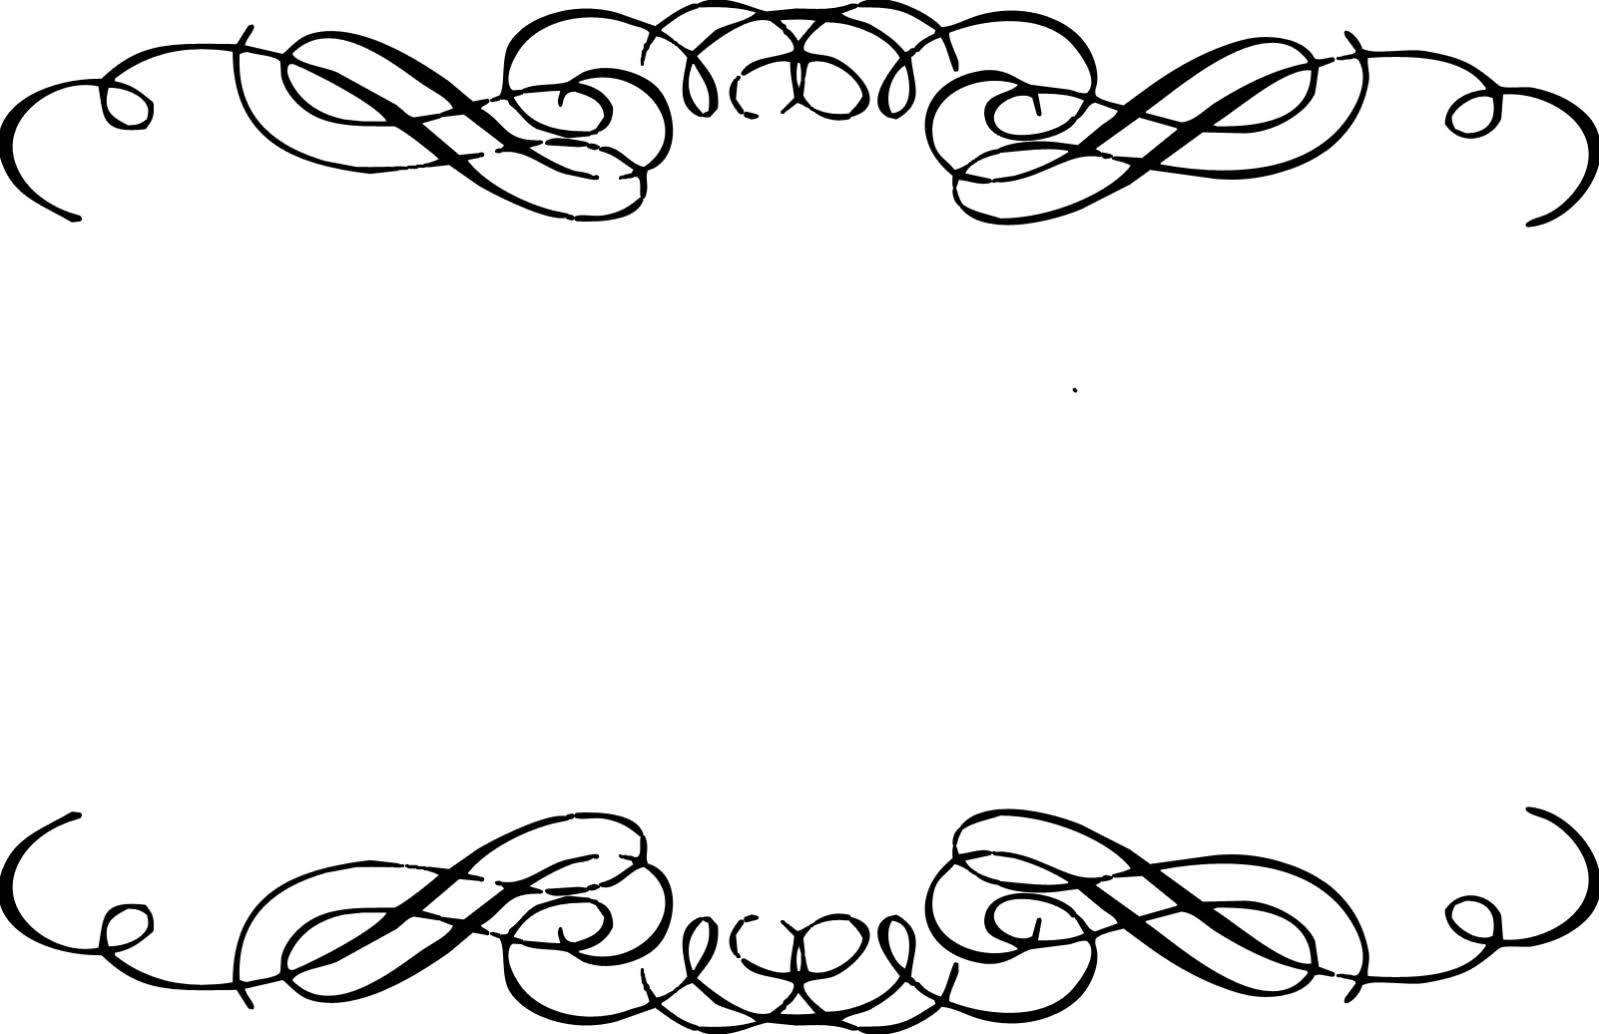 1599x1034 Scroll Clipart Free